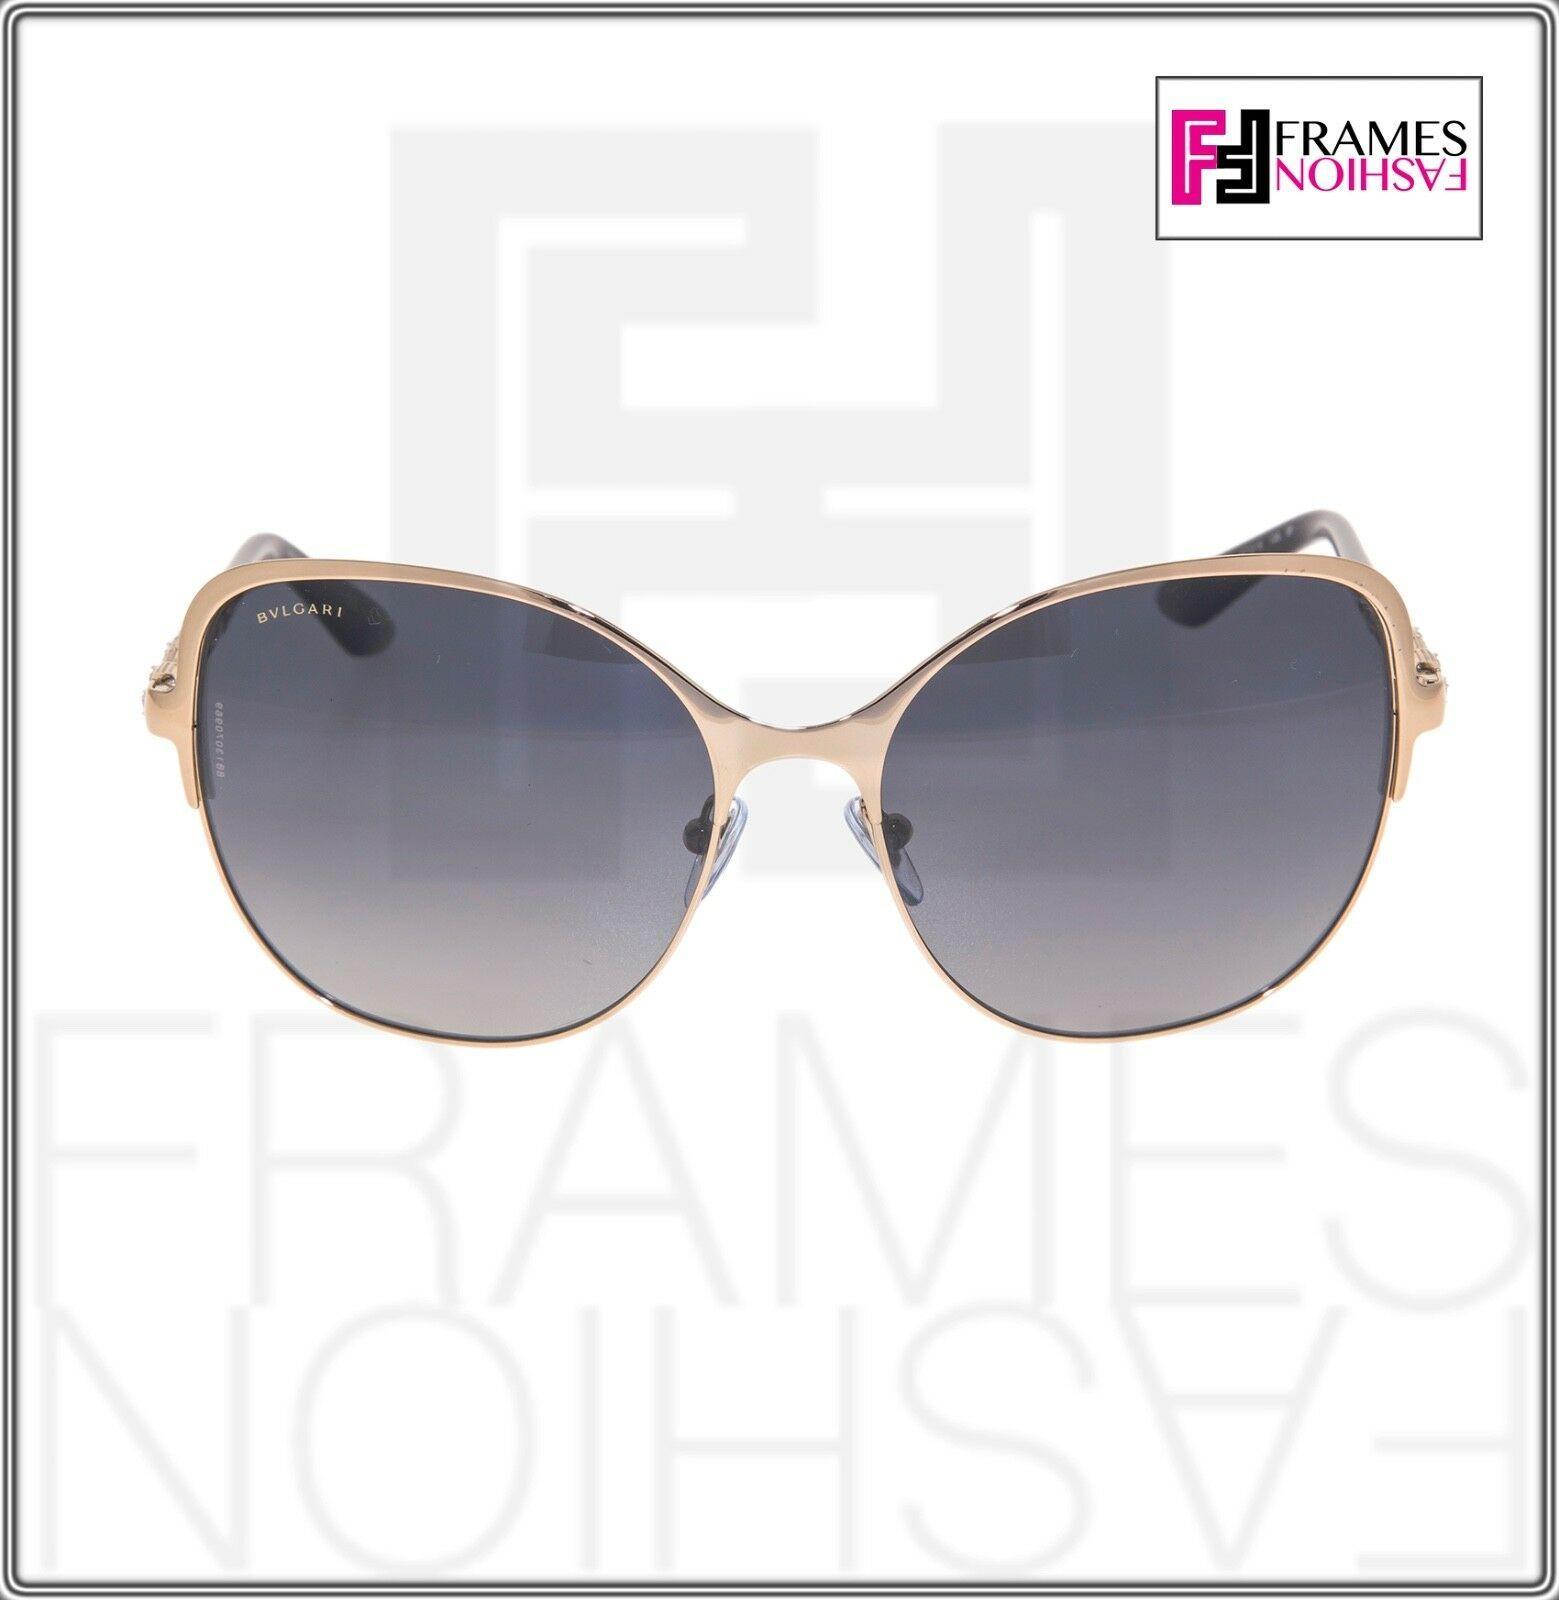 BVLGARI Le Gemme BV6078KB Black Gold 18K Plated POLARIZED Sunglasses 6078 Women image 6